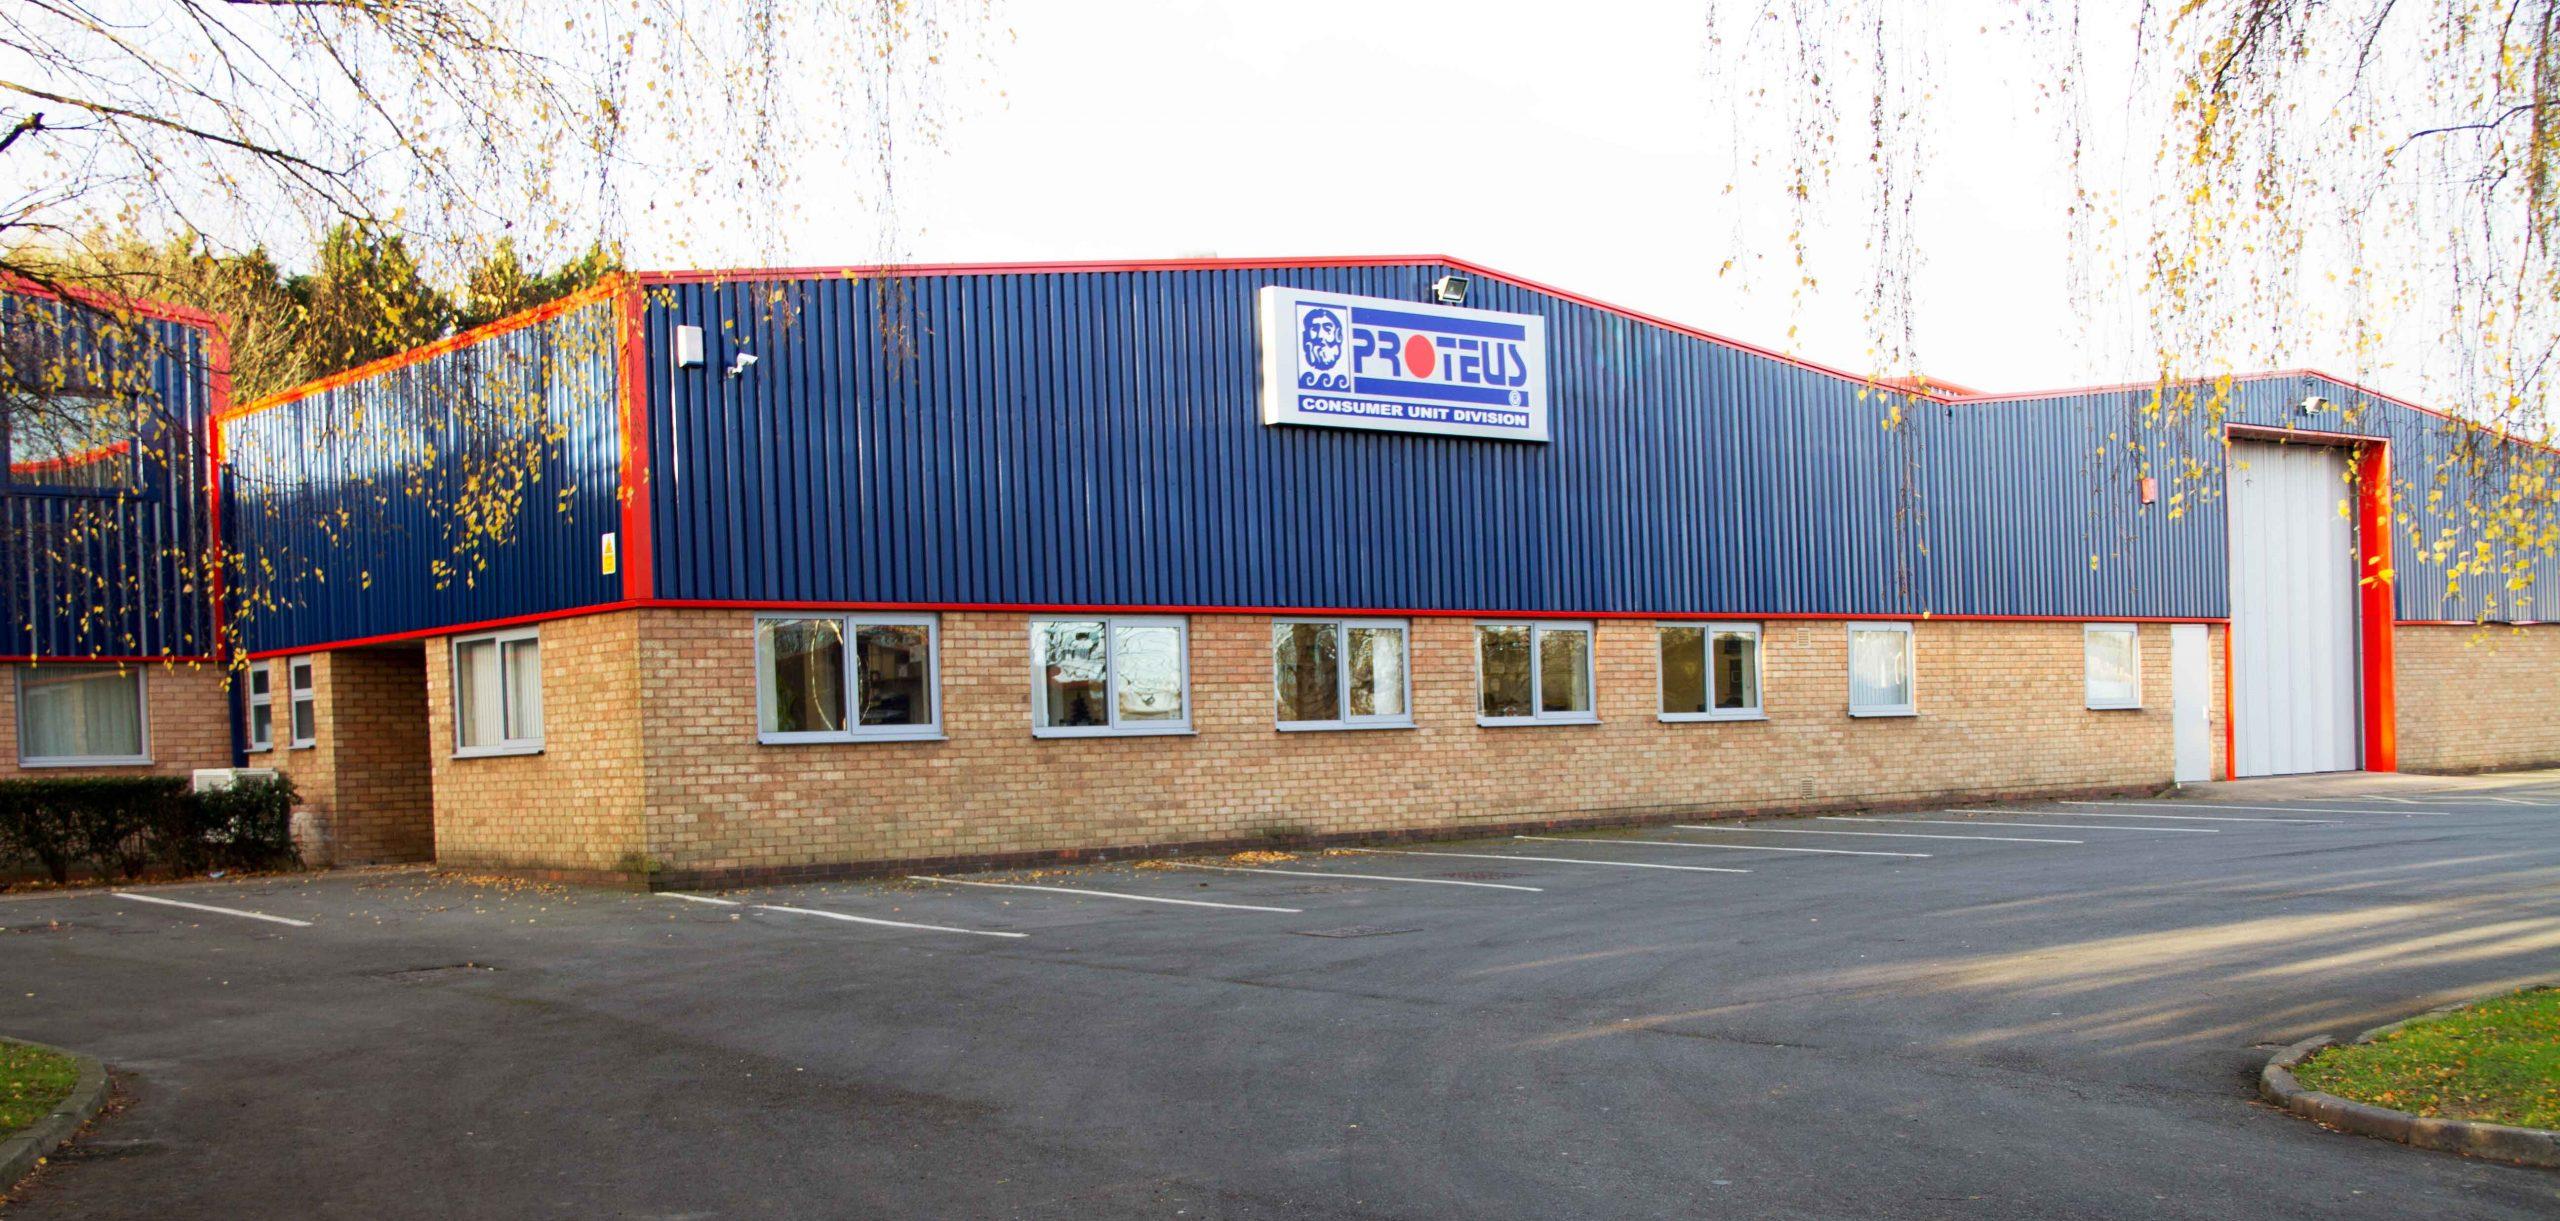 Proteus-Consumer-Factory